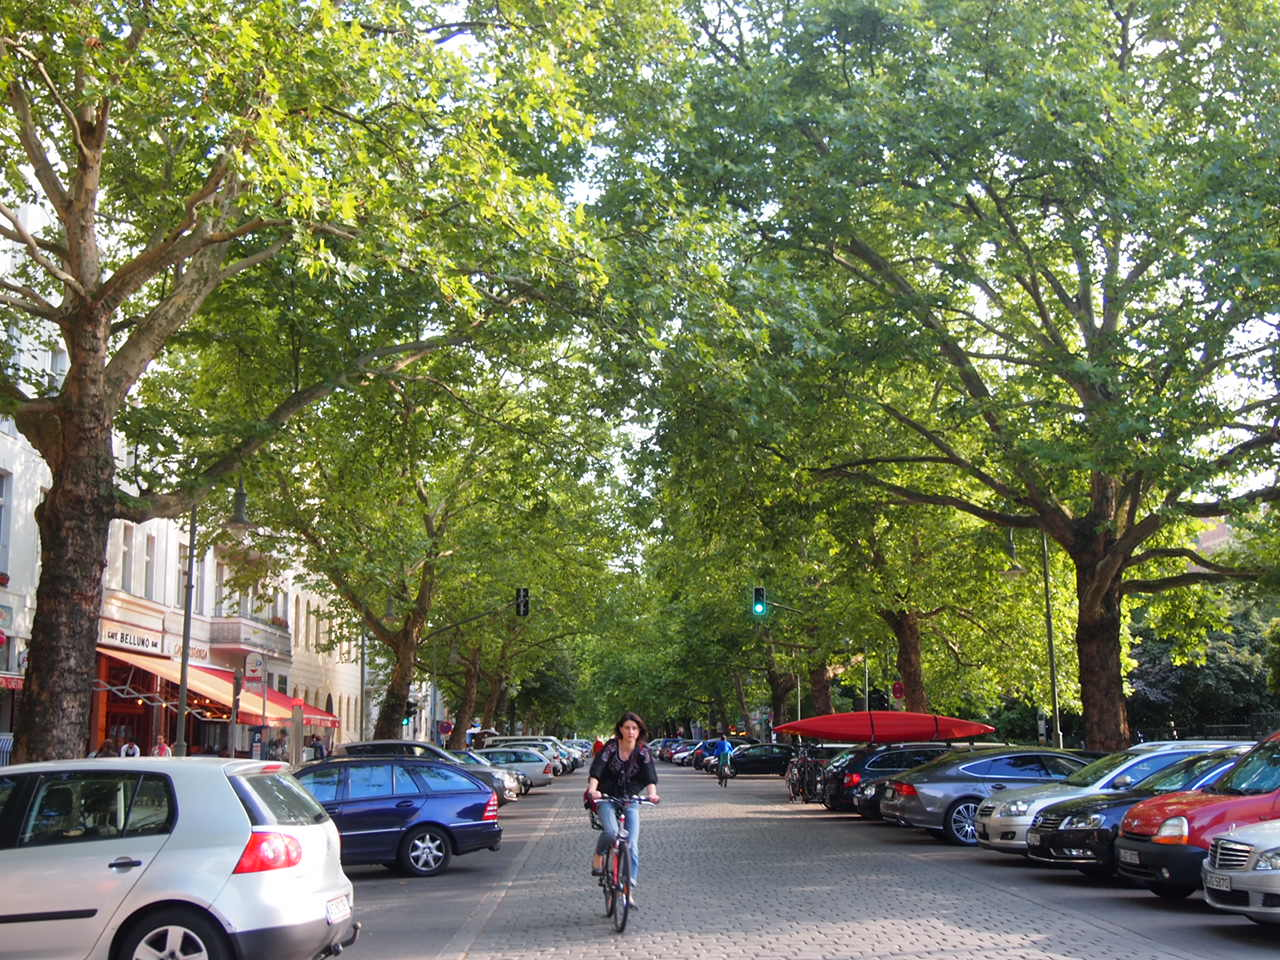 P6306206 アートと自然の多いベルリンの街並み